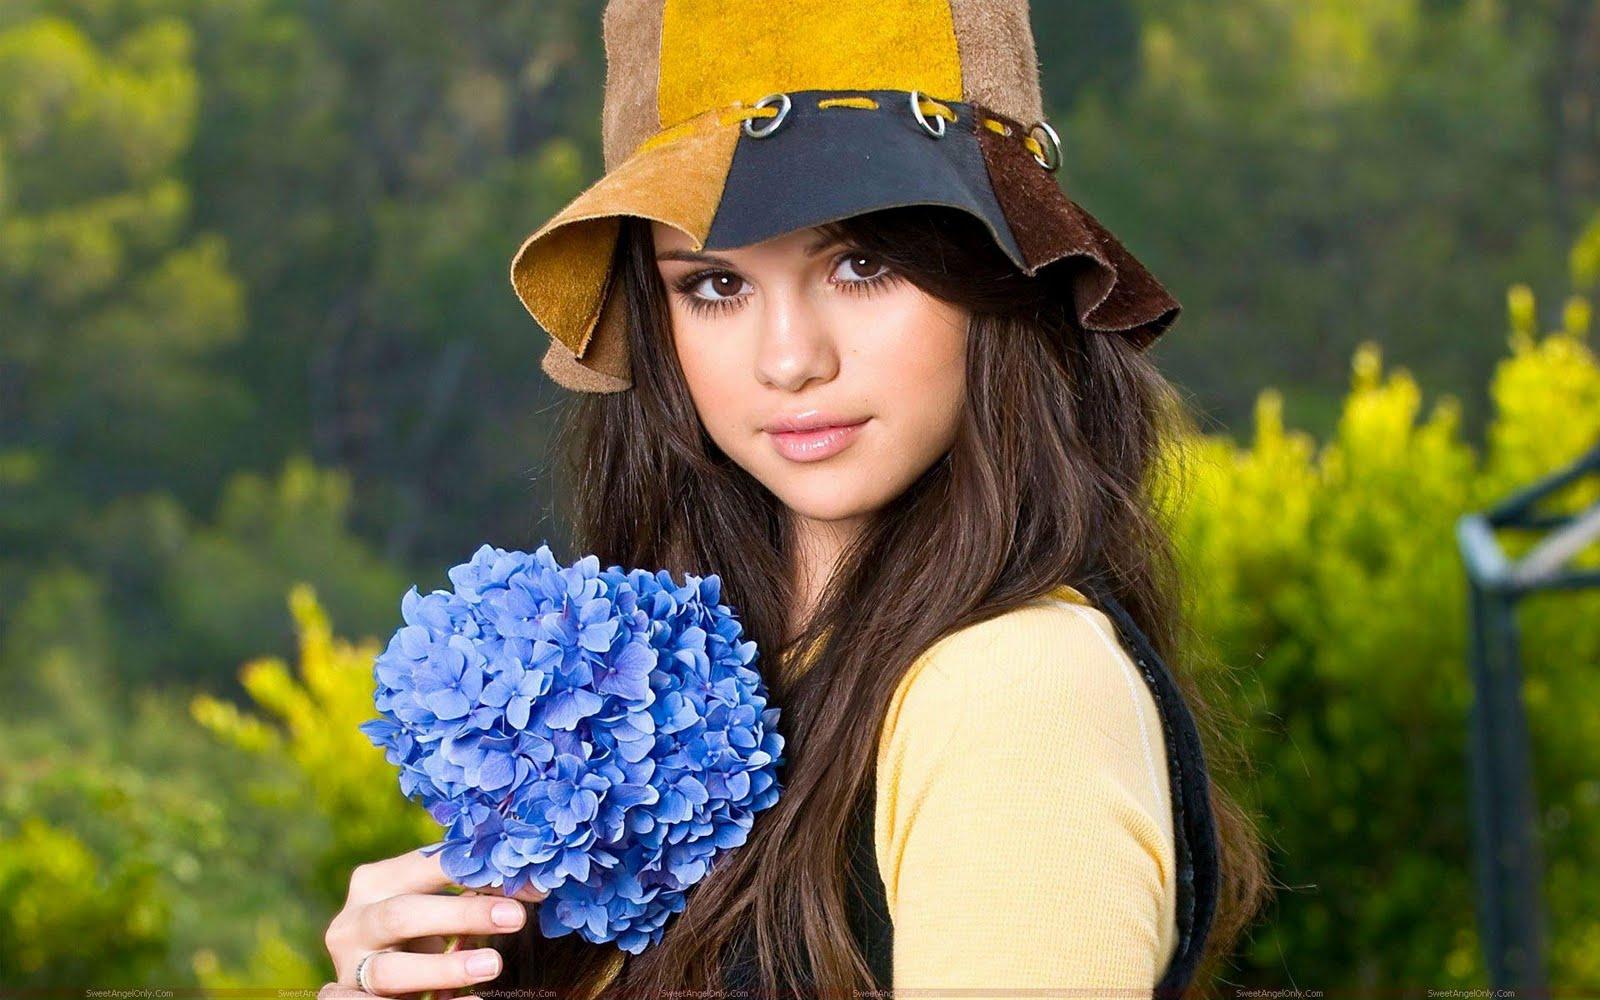 http://3.bp.blogspot.com/-uXl-s8fO5xk/Trdc1huZSqI/AAAAAAAAAj8/ixfGt_BnZ-o/s1600/beautiful_selena_gomez_with_flower.jpg